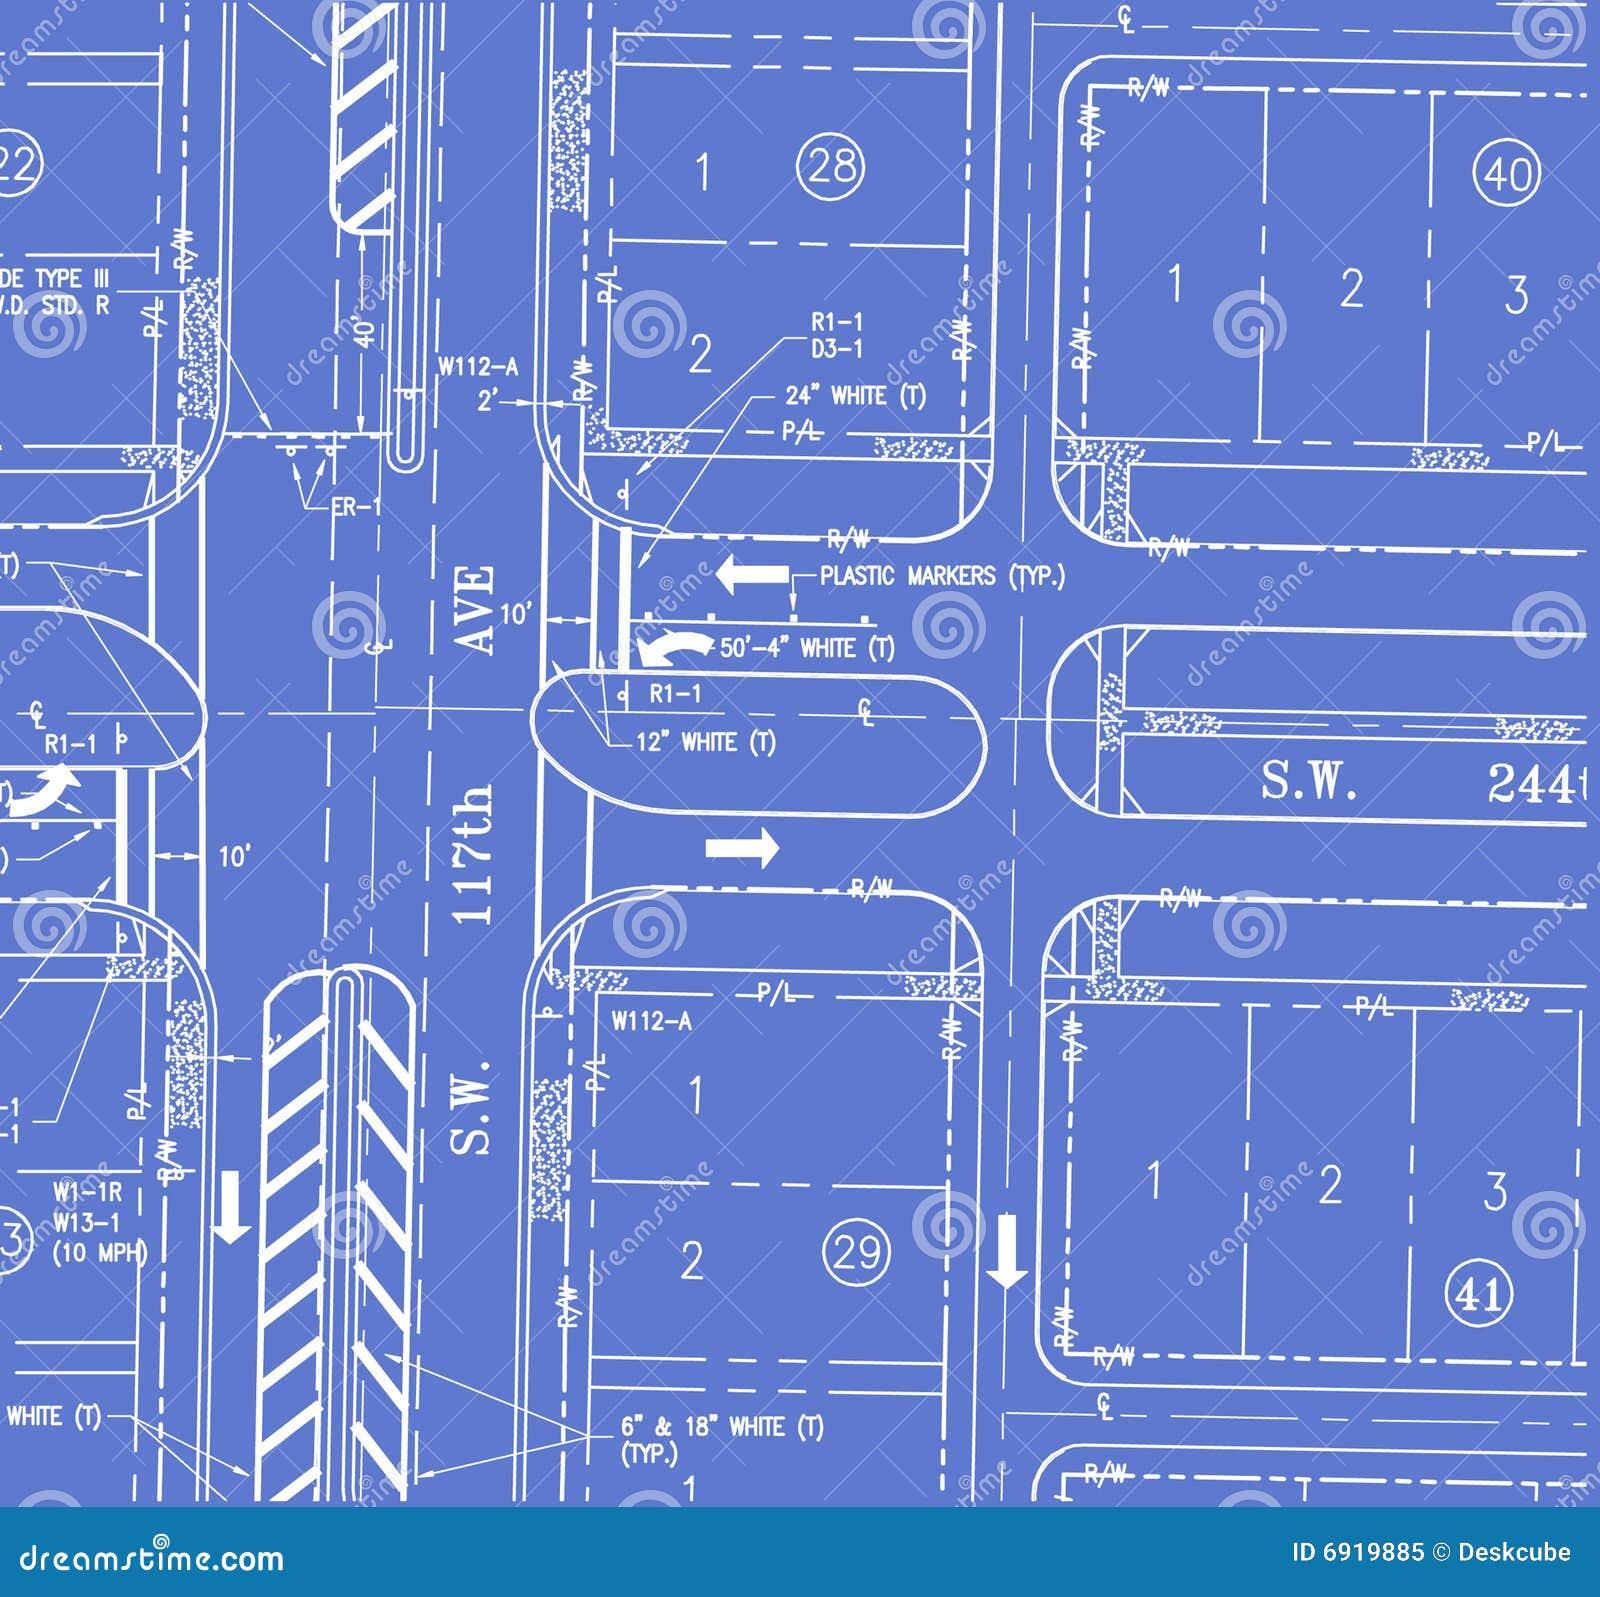 Traffic plan blueprint